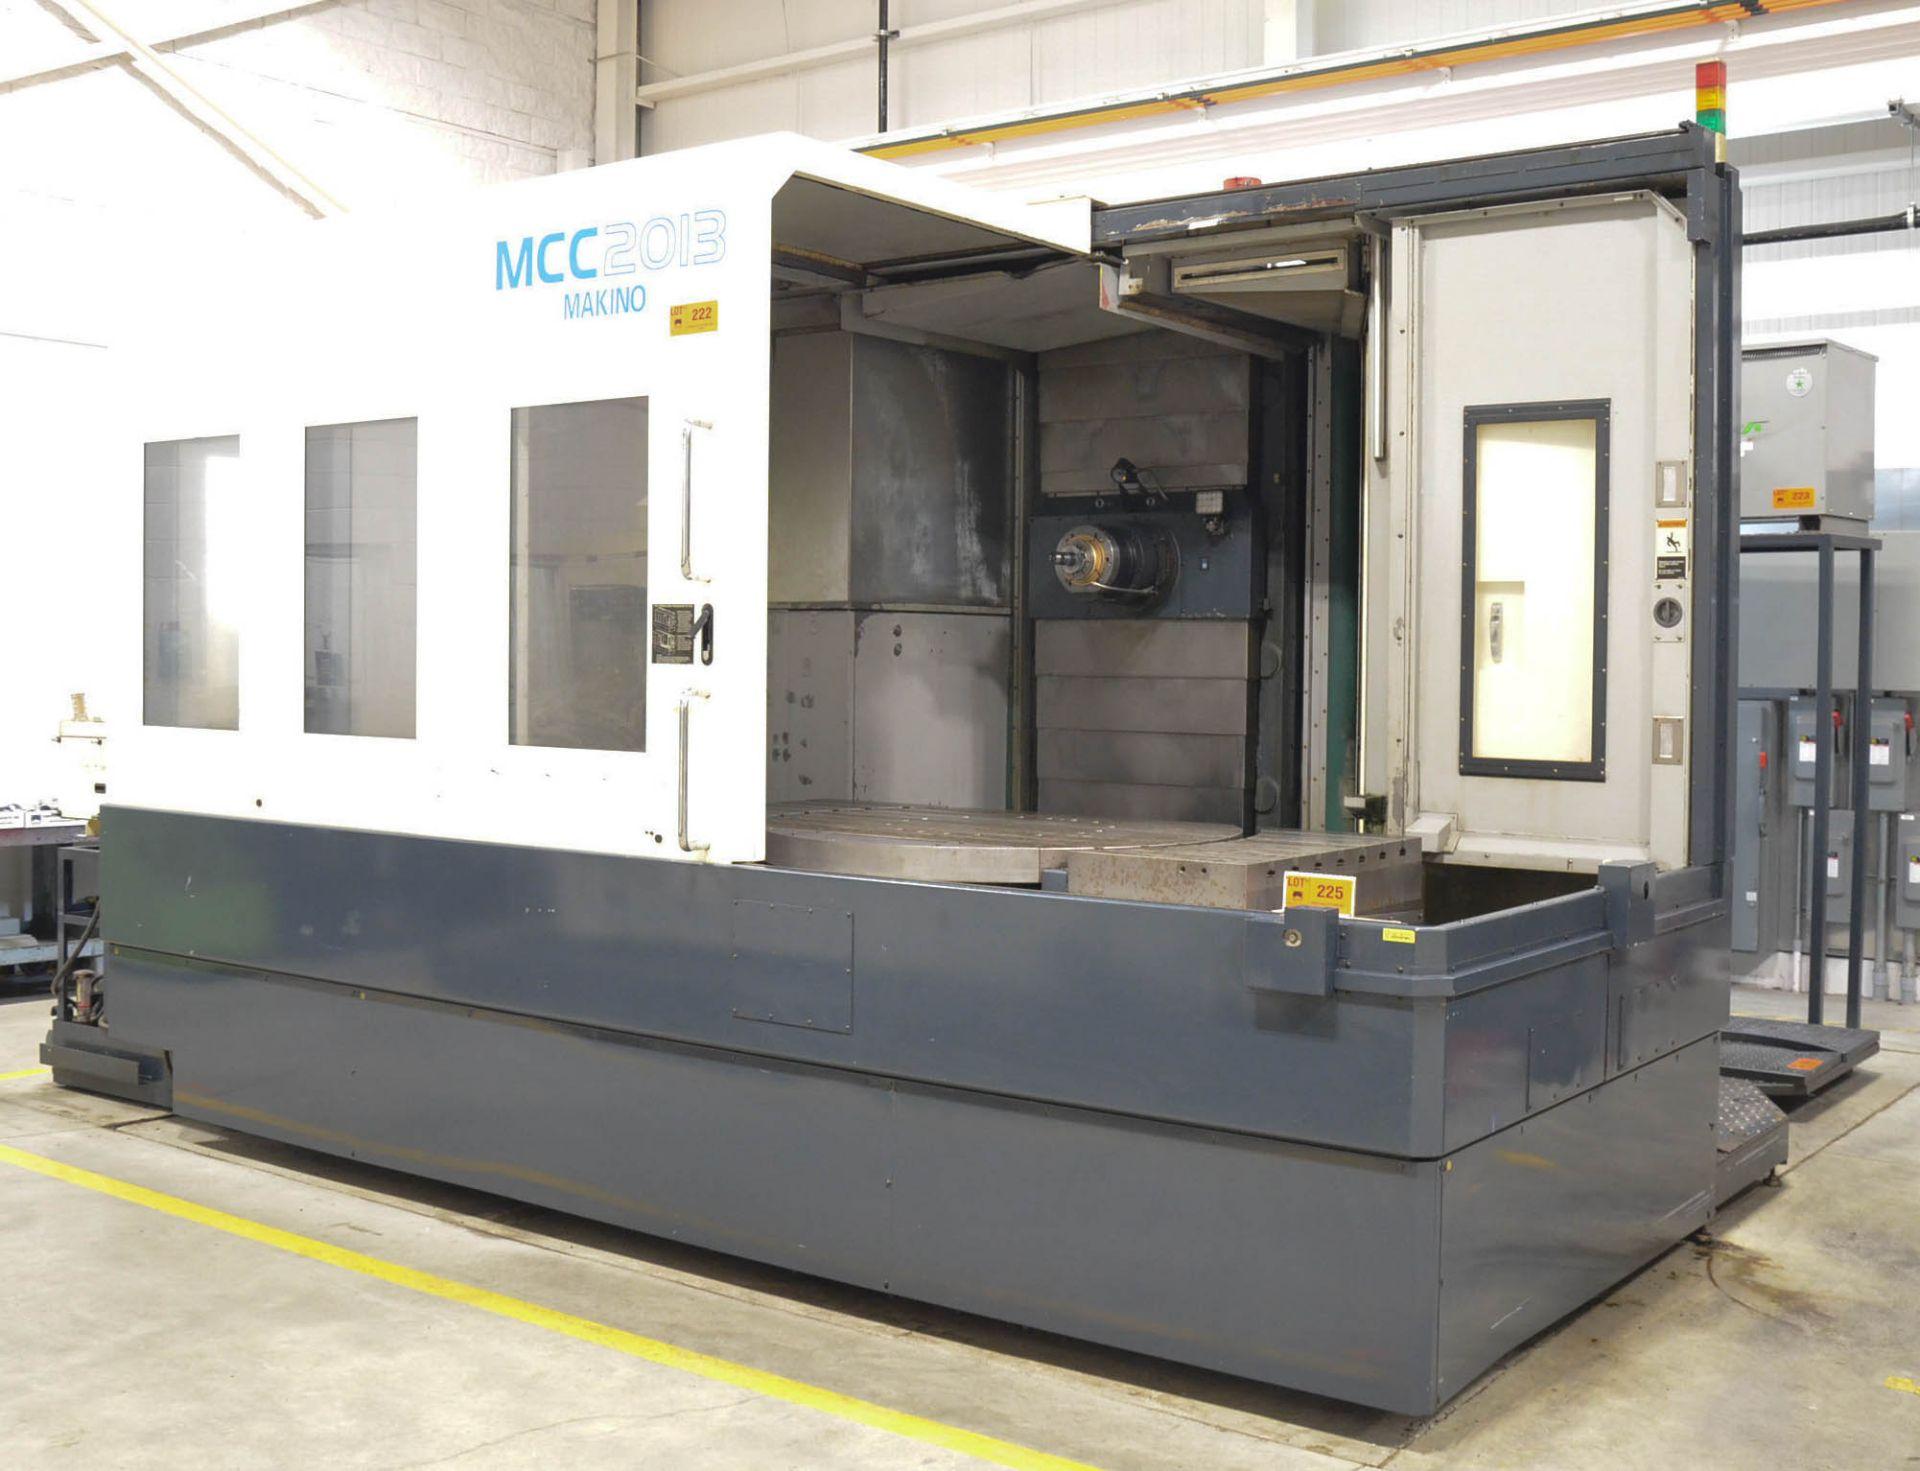 MAKINO (2008) MCC2013 4-AXIS HORIZONTAL MACHINING CENTER WITH MAKINO PROFESSIONAL 5 CNC CONTROL, - Image 2 of 12